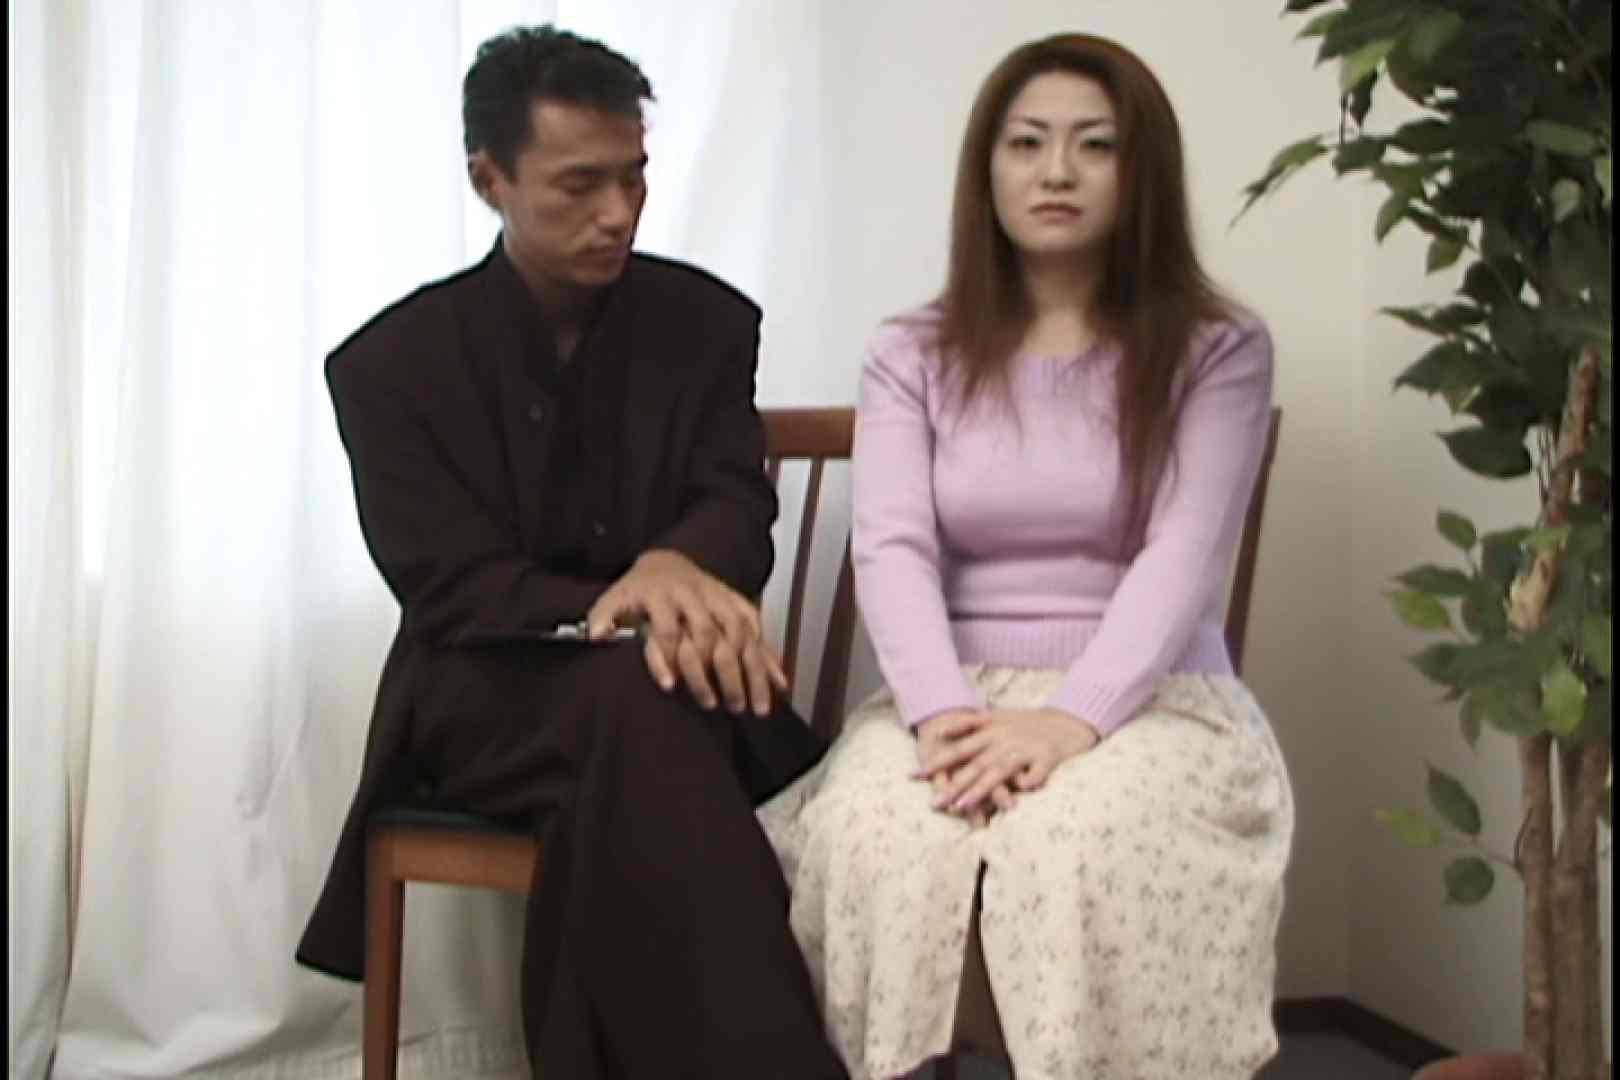 昼間の奥様は欲求不満 ~青井祐子~ 熟女  43連発 14